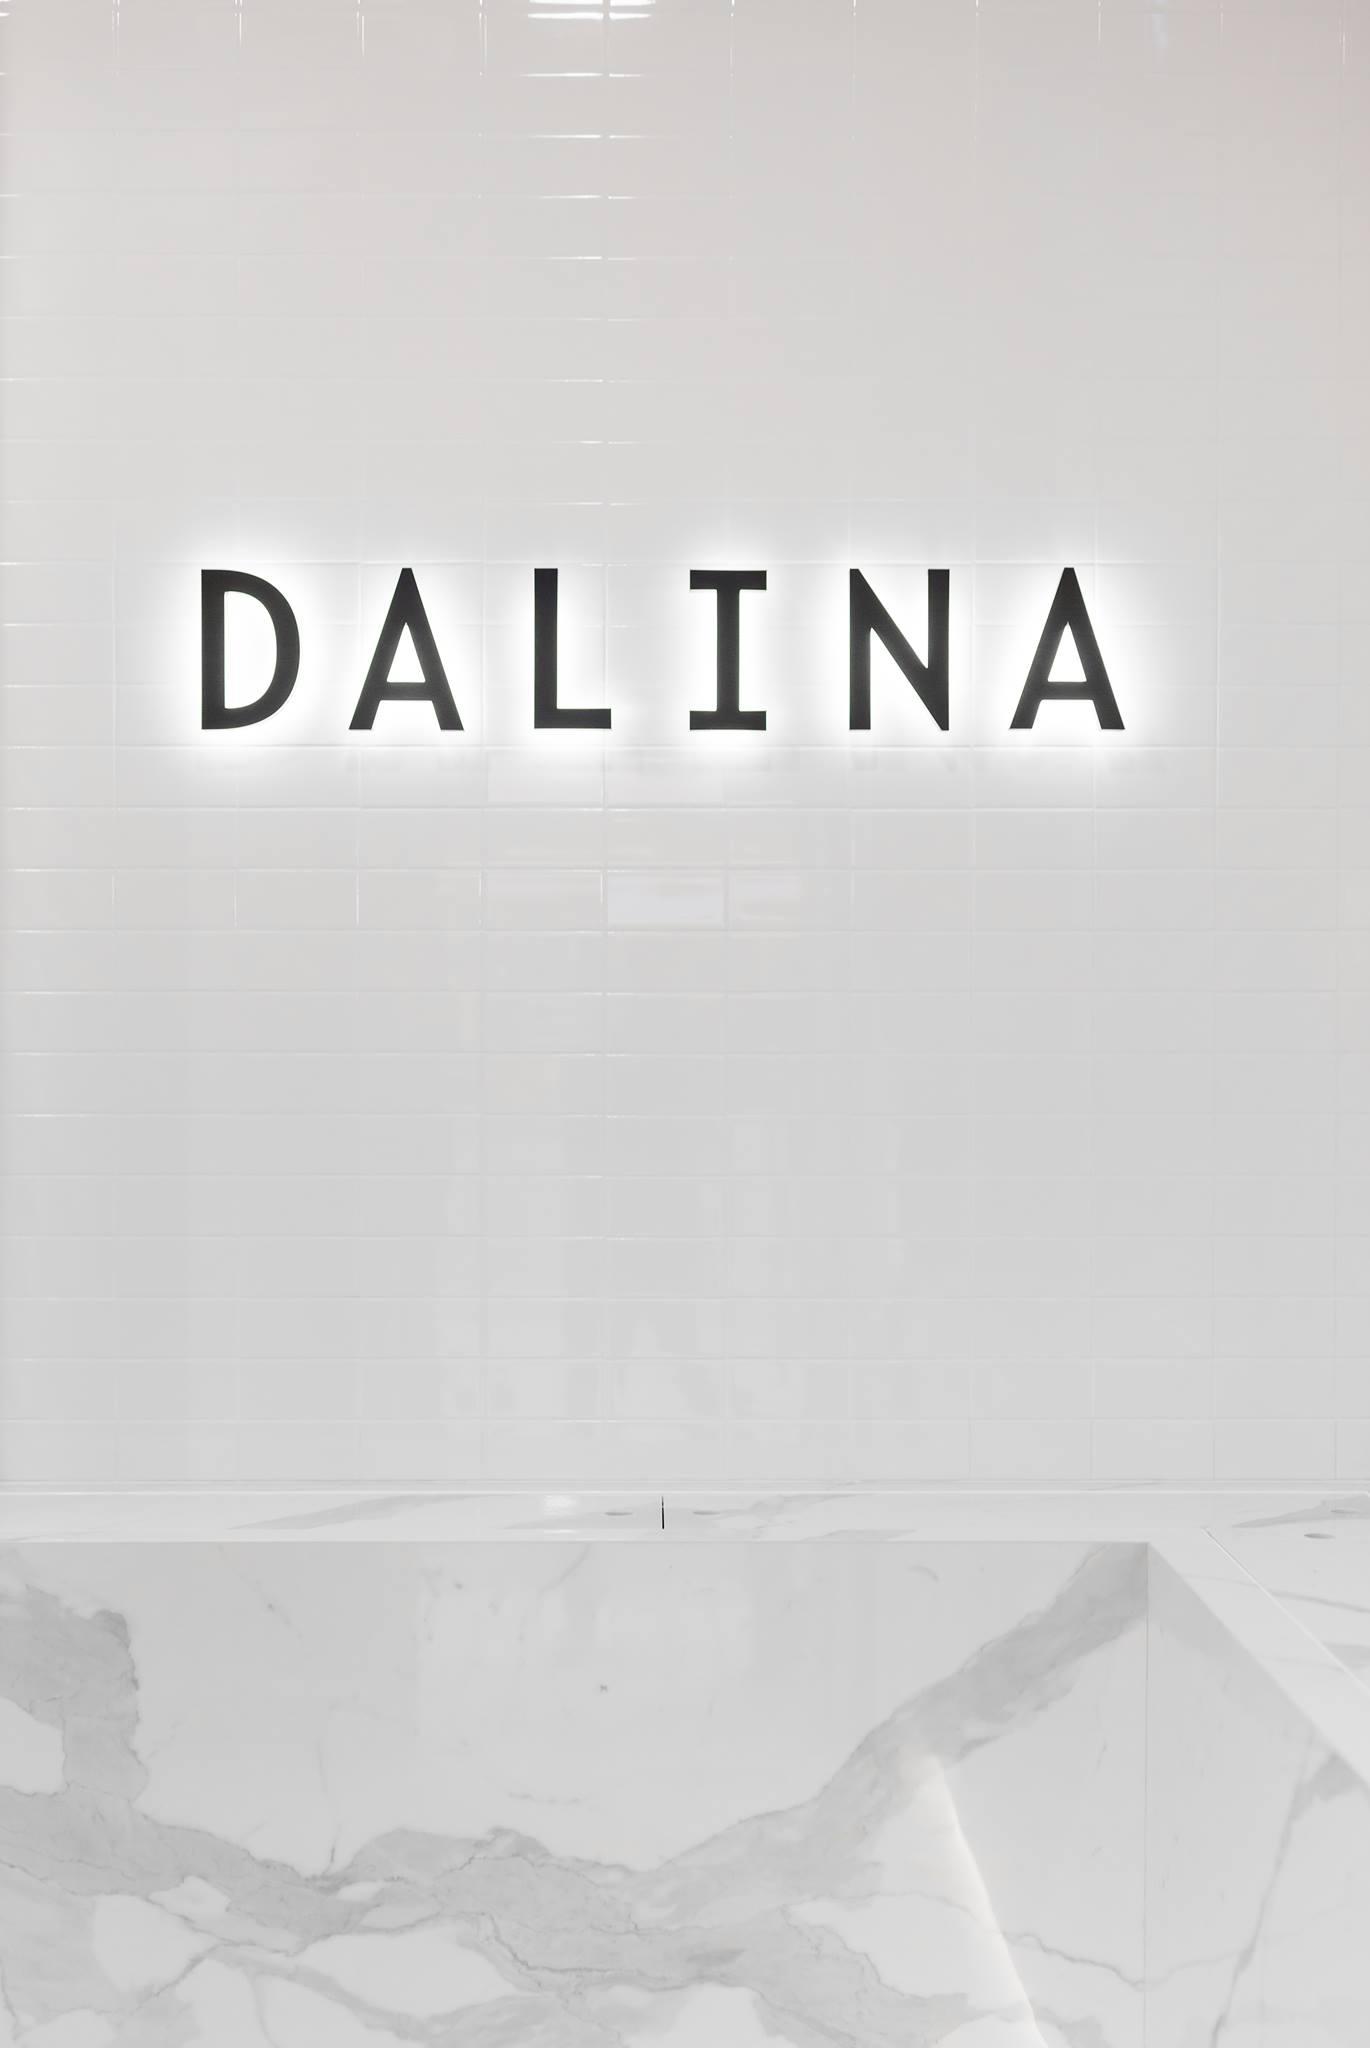 Dalina1